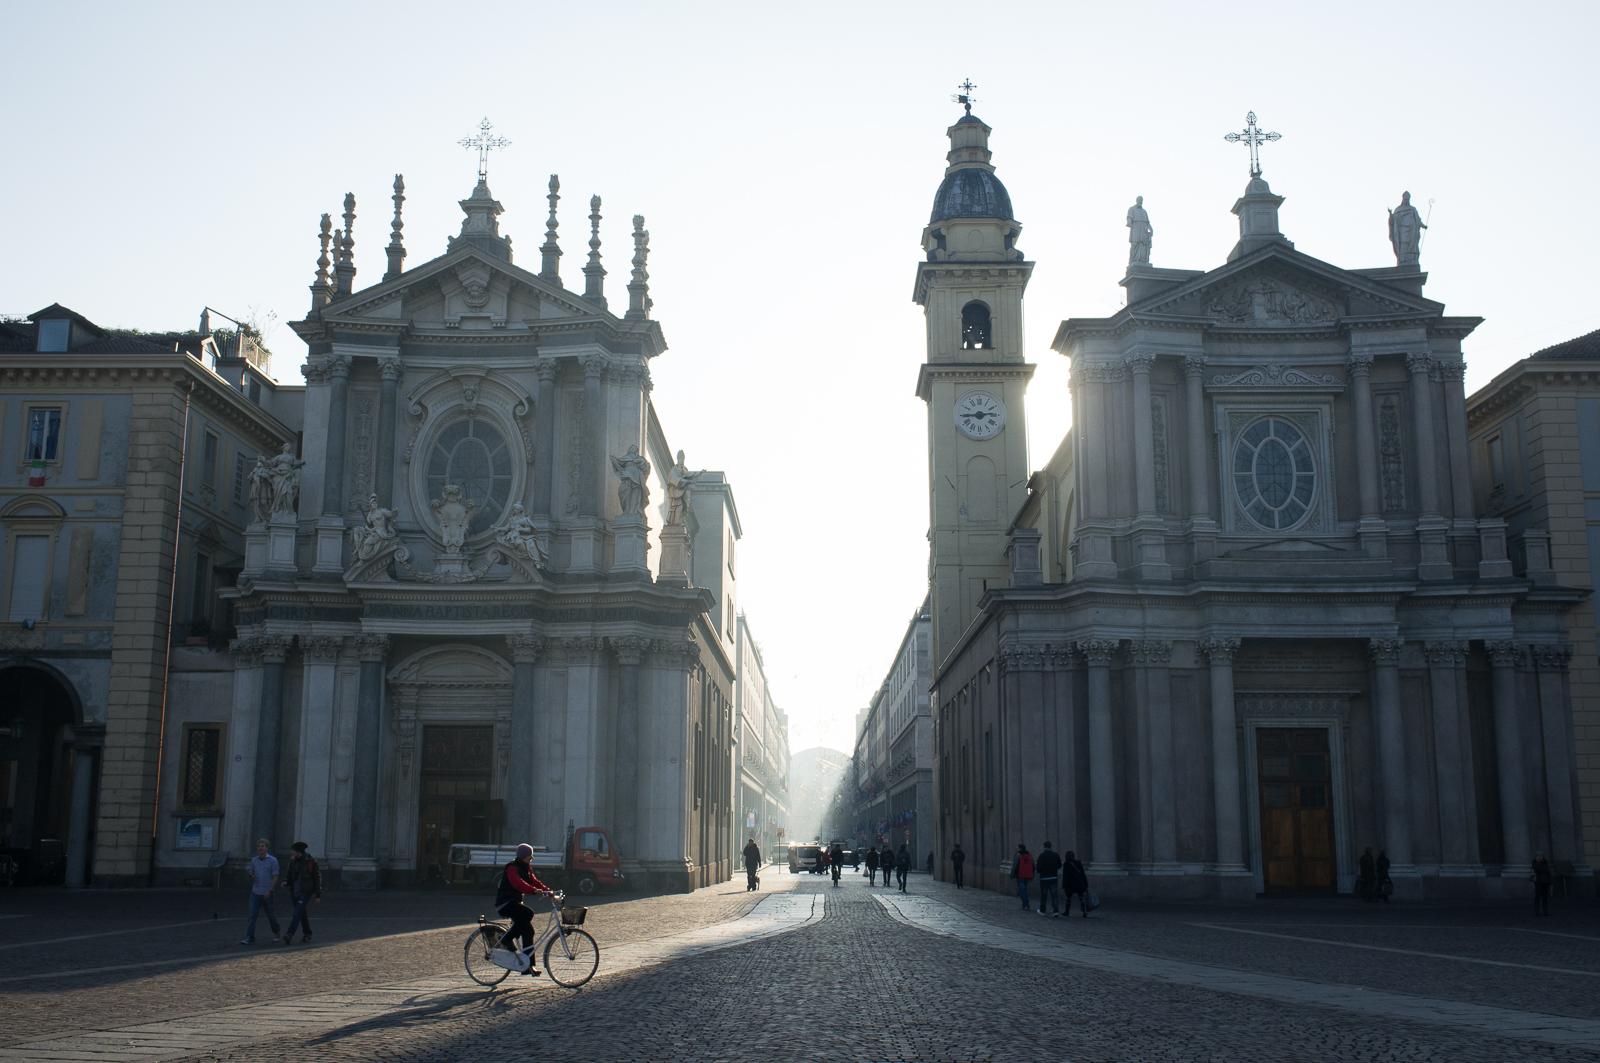 The twin churches San Carlo and Santa Cristina, Piazza San Carlo, Turin